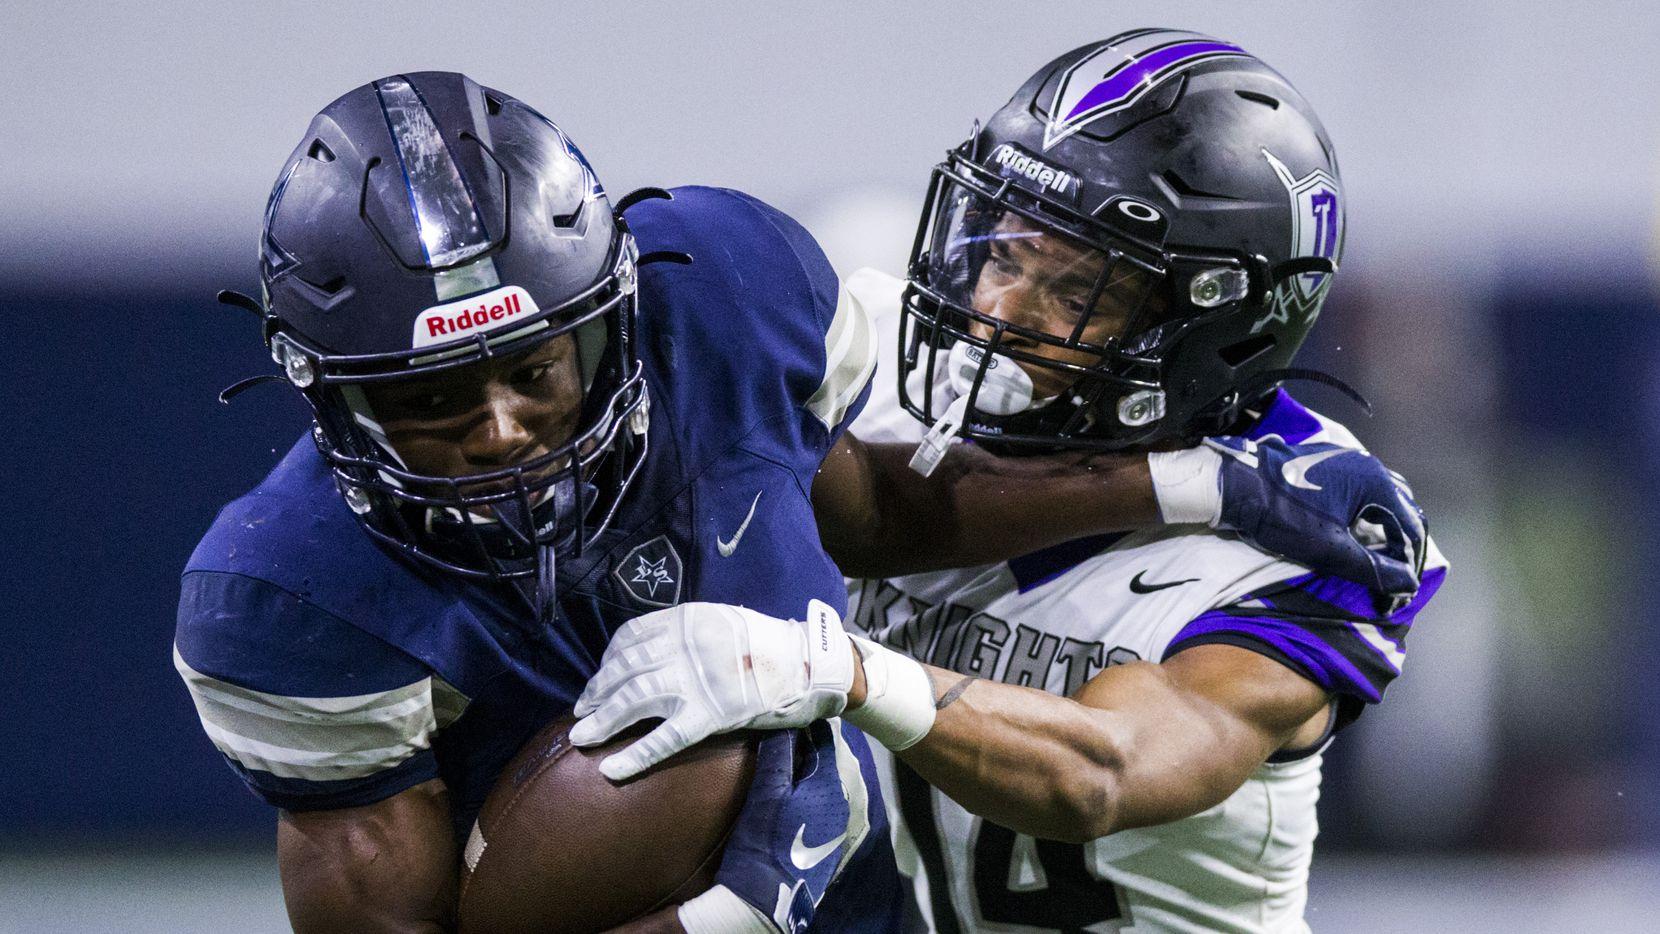 Statewide Week 7 Texas High School Football Scores